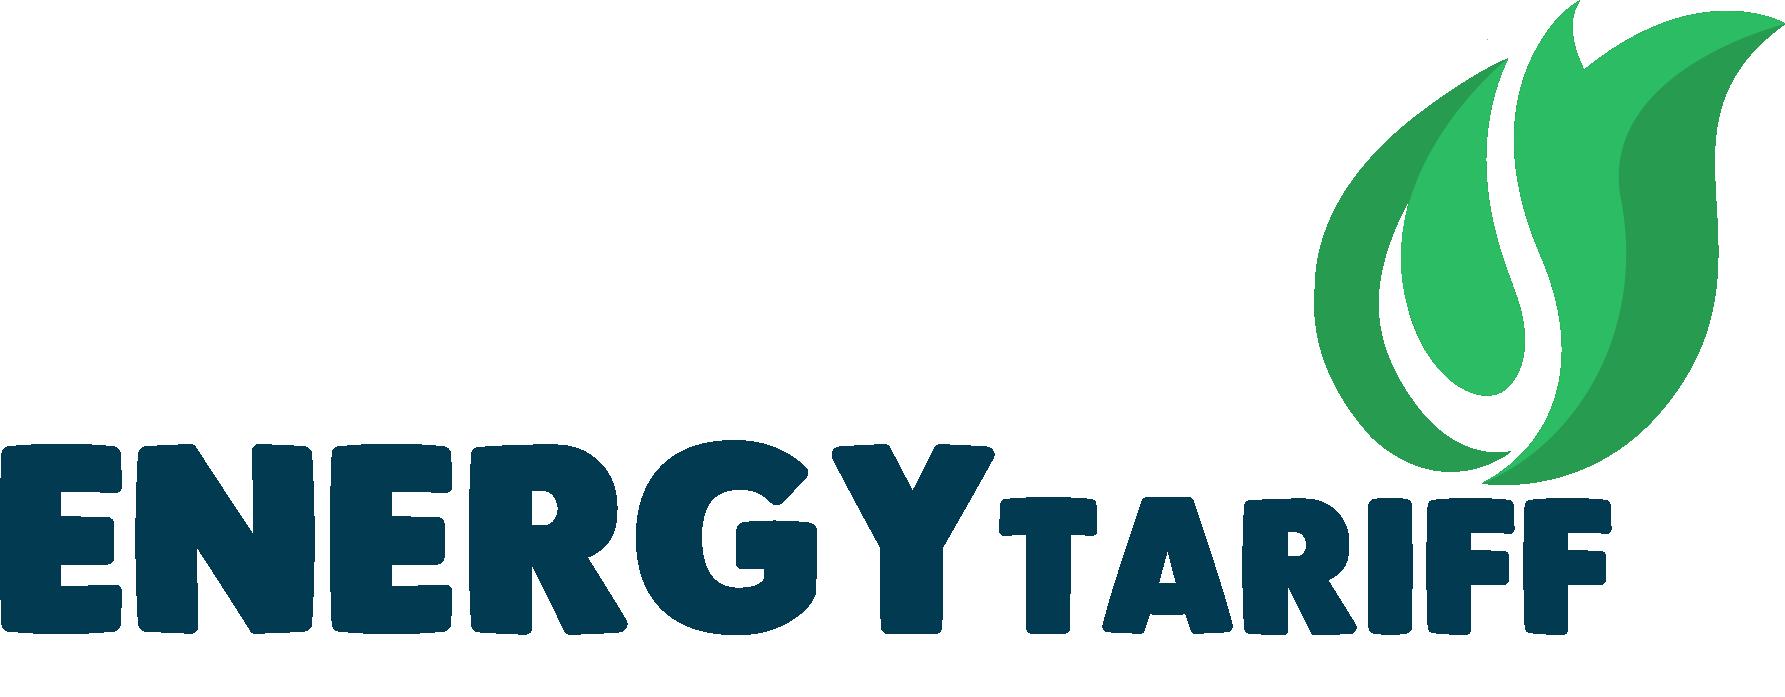 Energy Tariff | Energy Savings | Compare utilities Logo